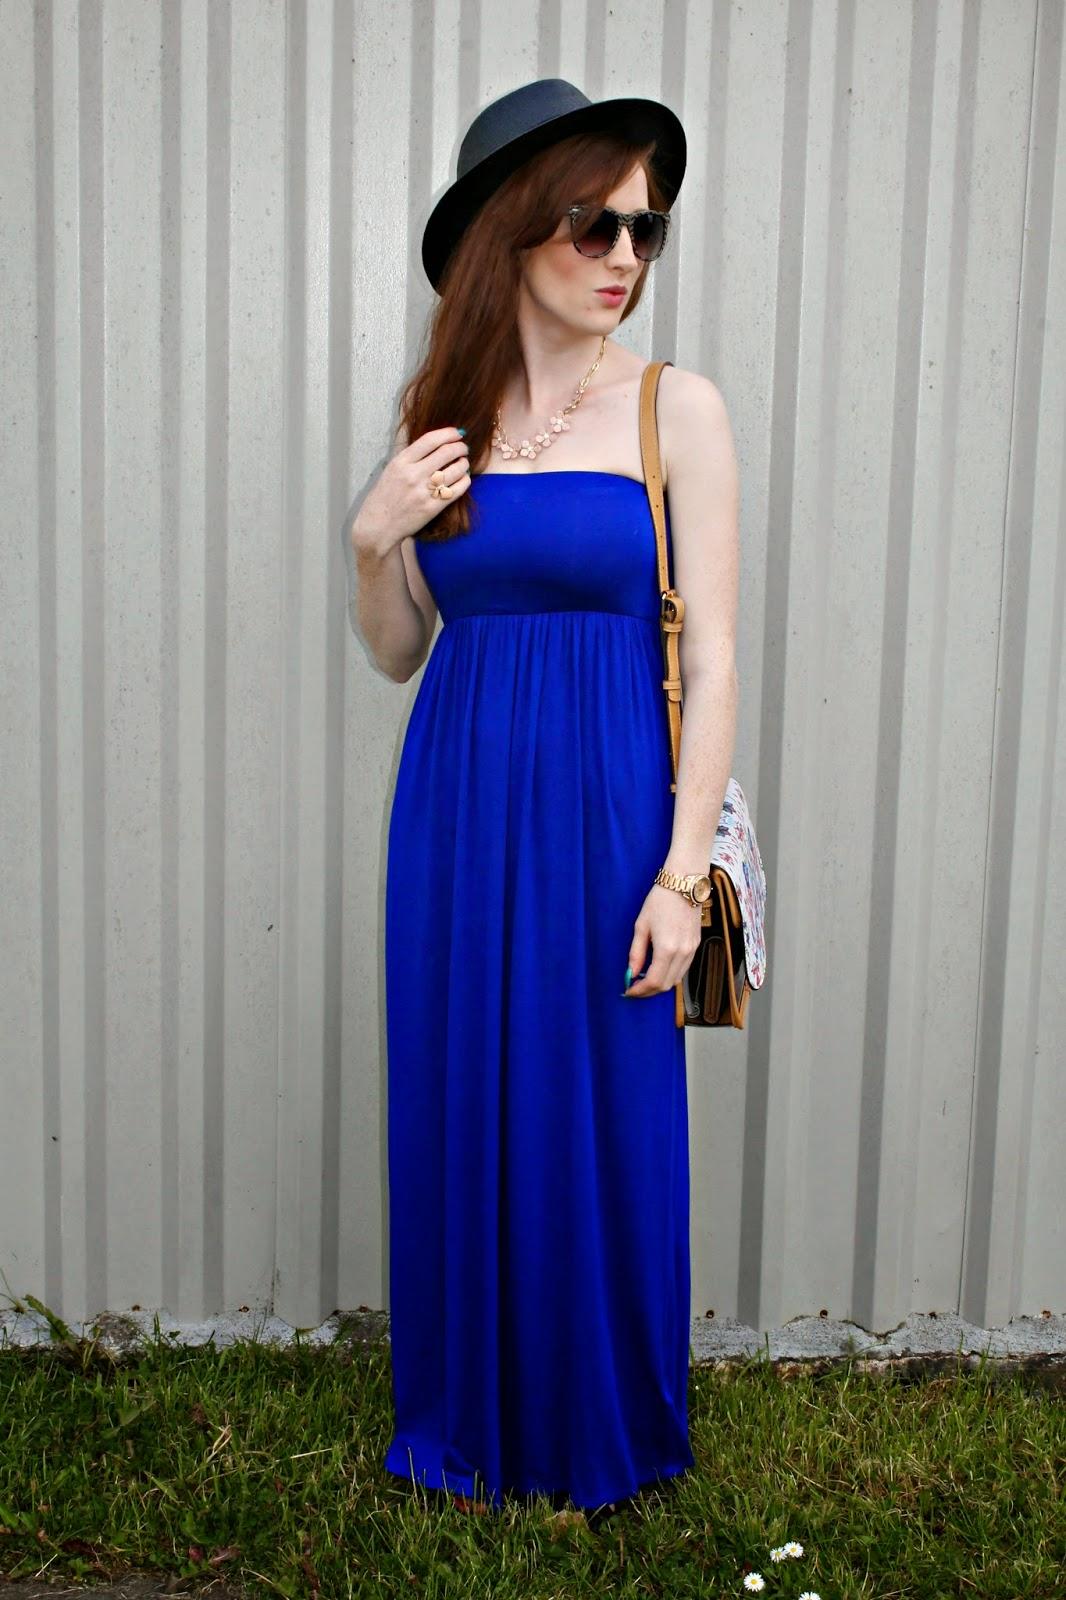 bec boop blue fashion